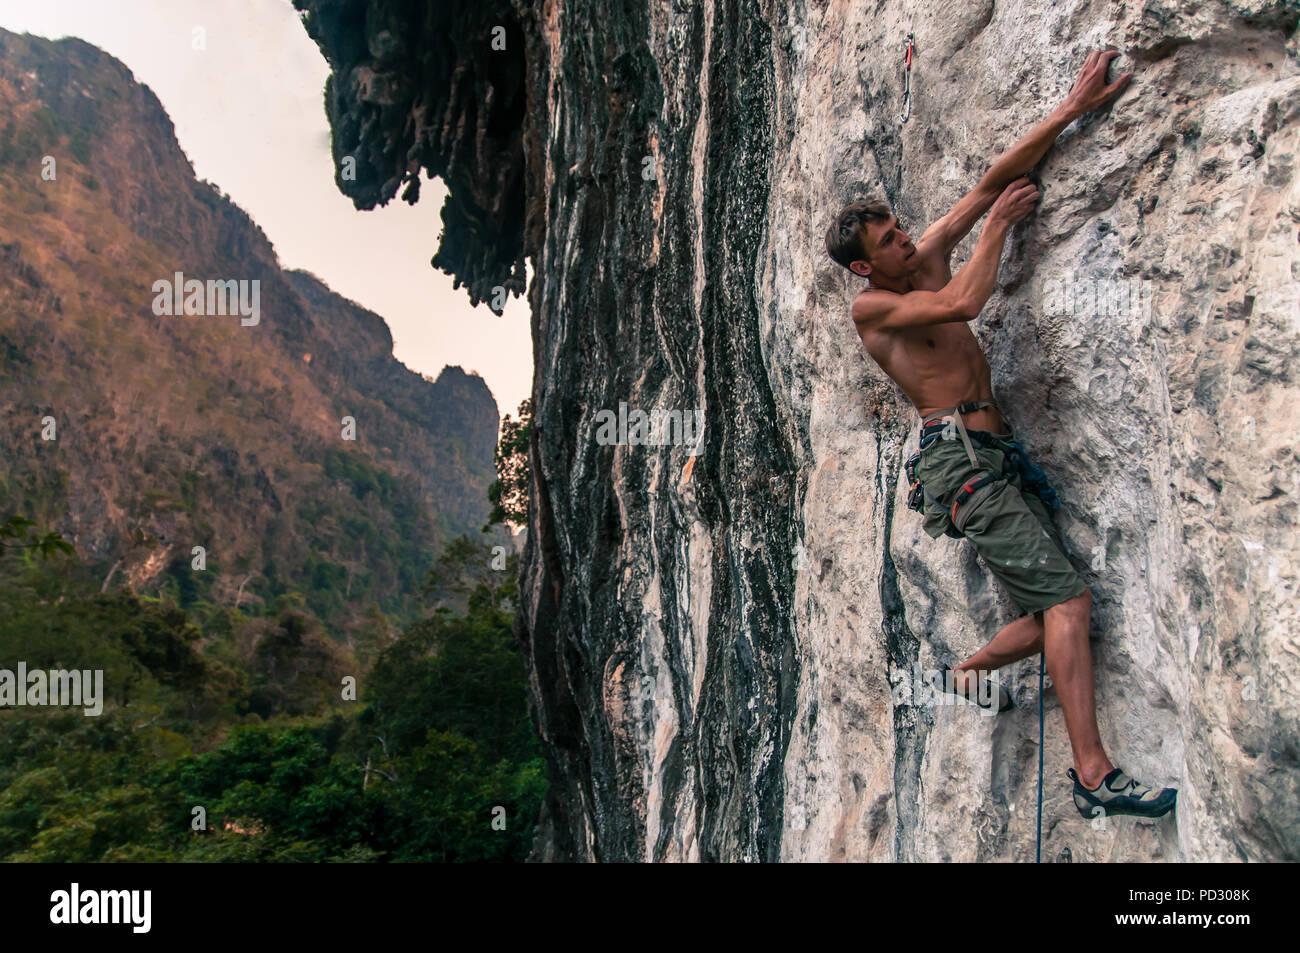 Man sport climbing on limestone, Thakhek, Laos - Stock Image